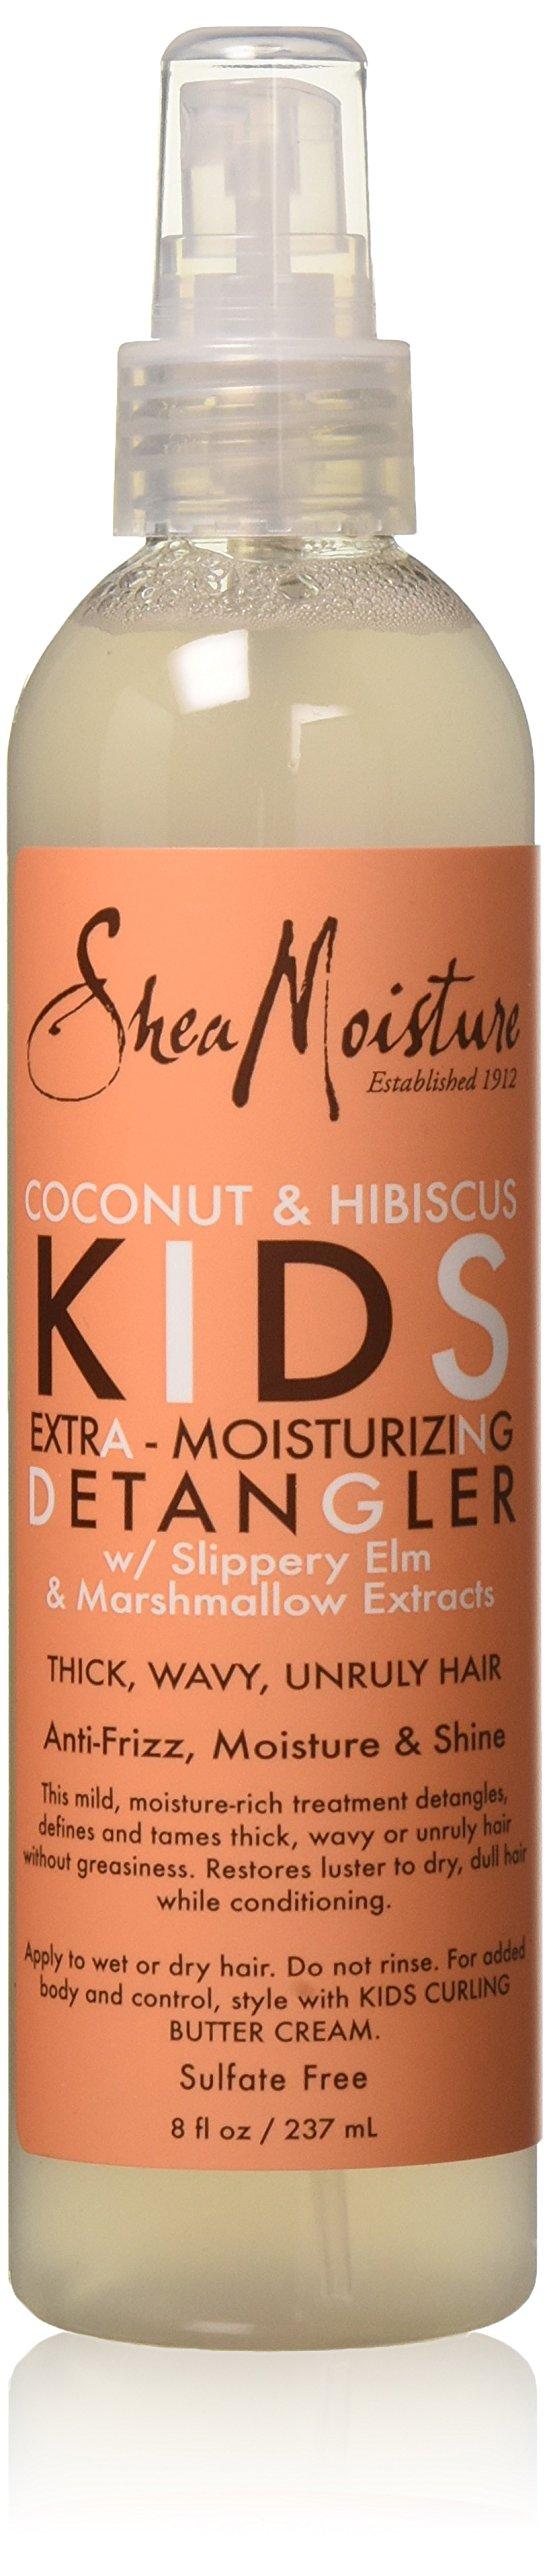 Shea Moisture Kids Extra-Moisturizer Detangler, Coconut & Hibiscus, 8 Ounce